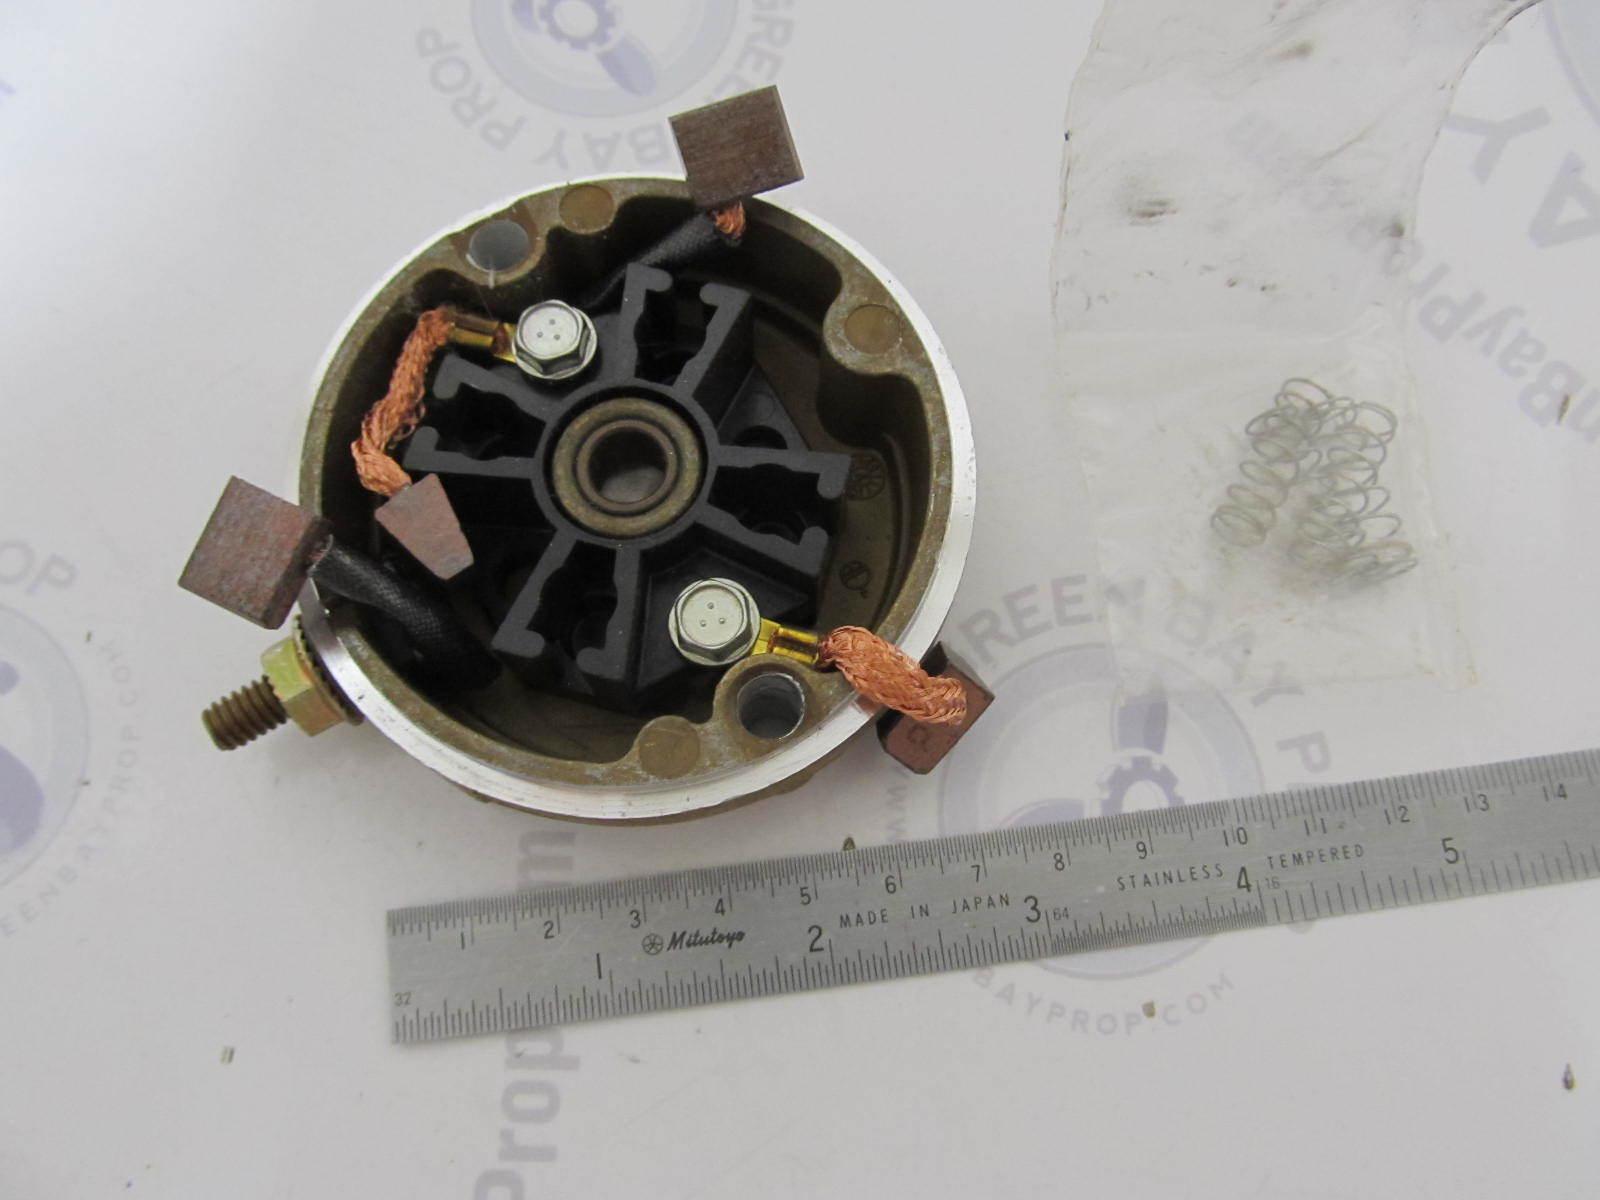 0585265 585265 OMC Evinrude Johnson 20-35 HP Outboard